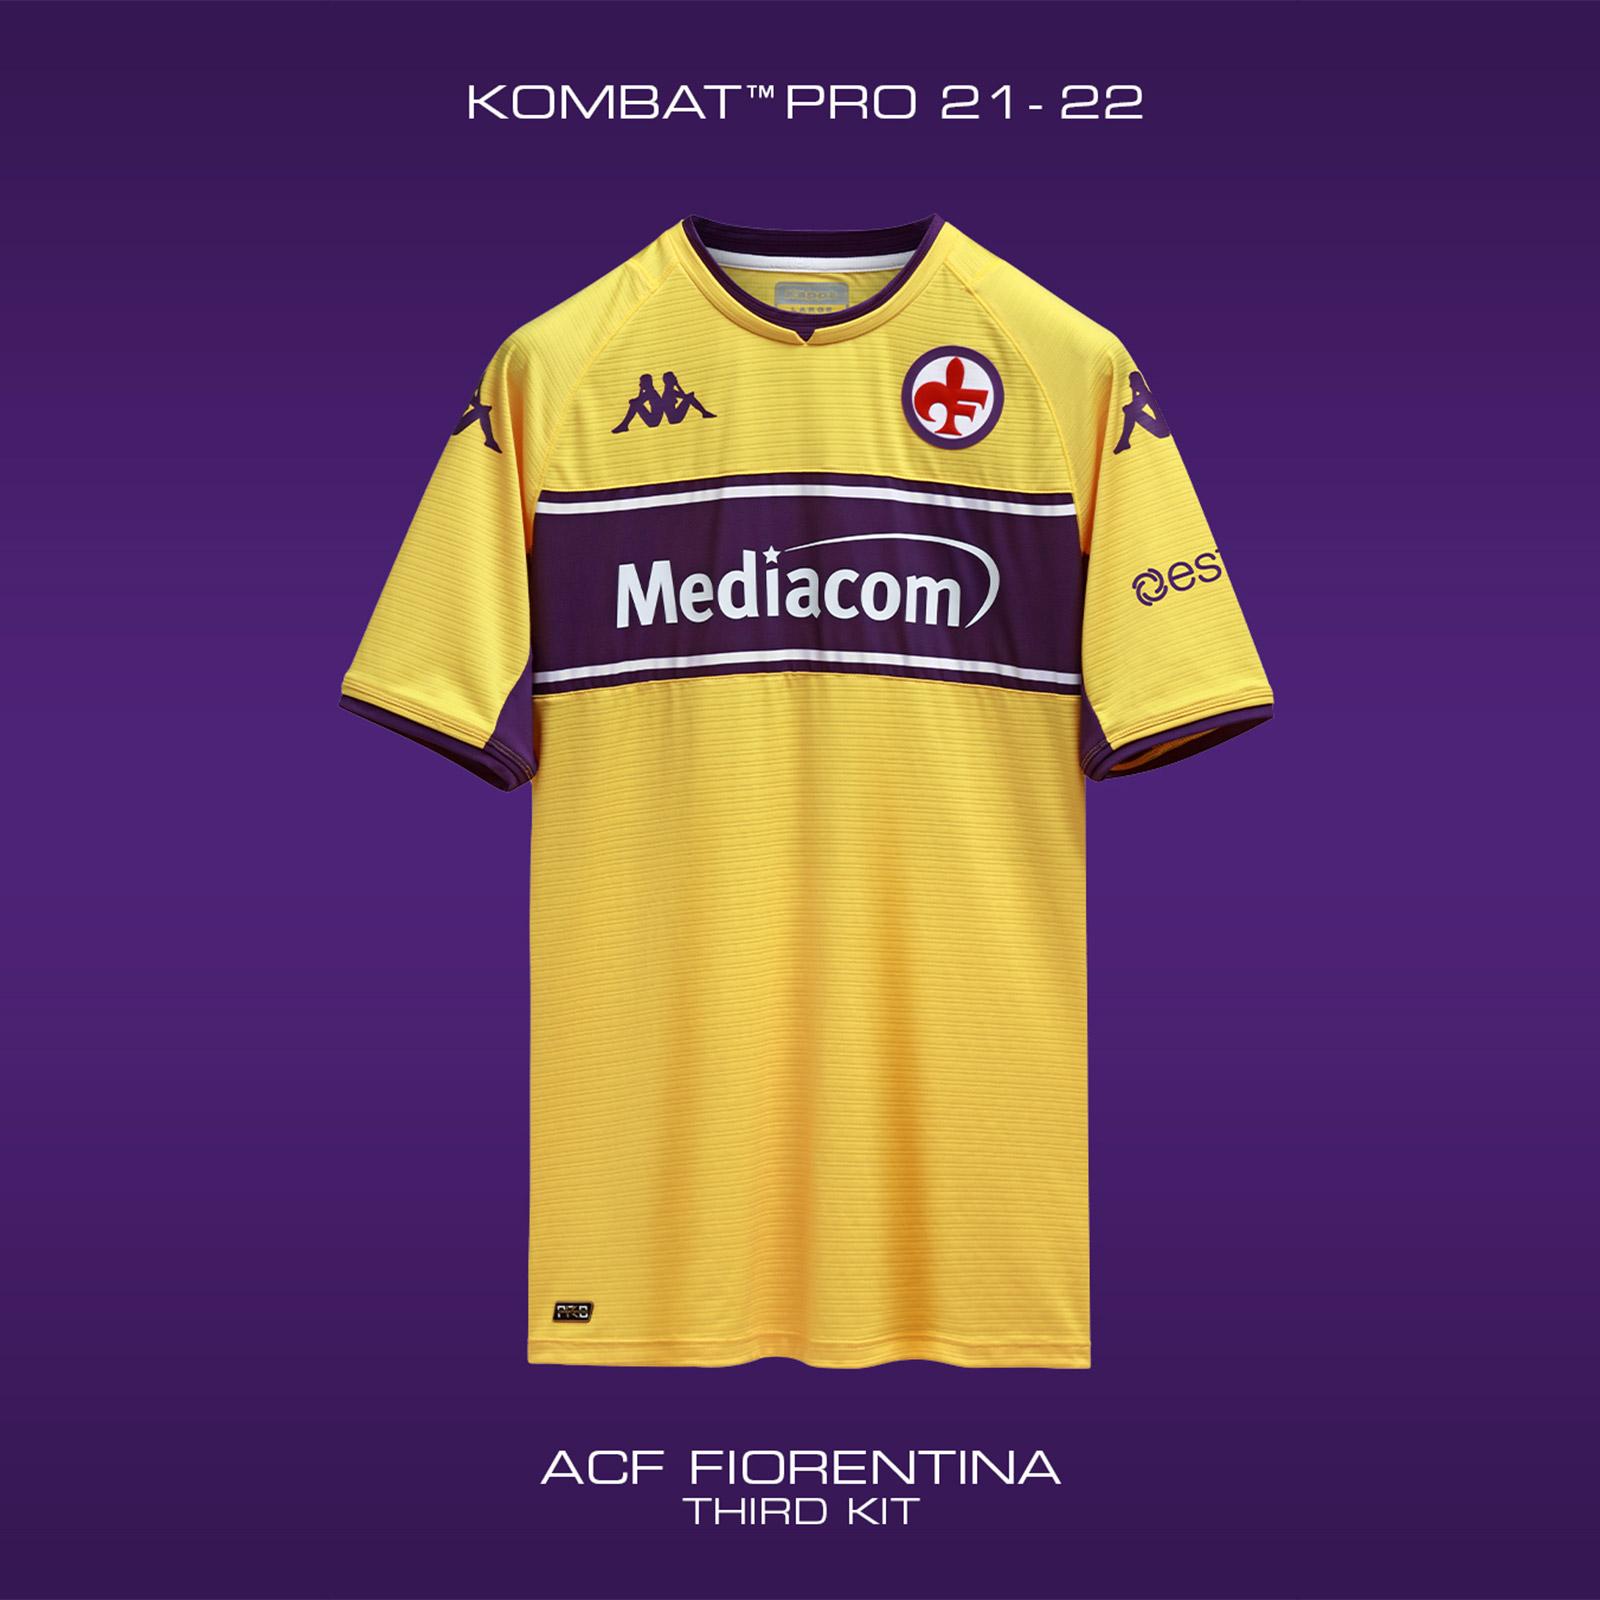 fiorentina_2021_2022_kappa_kits_e.jpeg